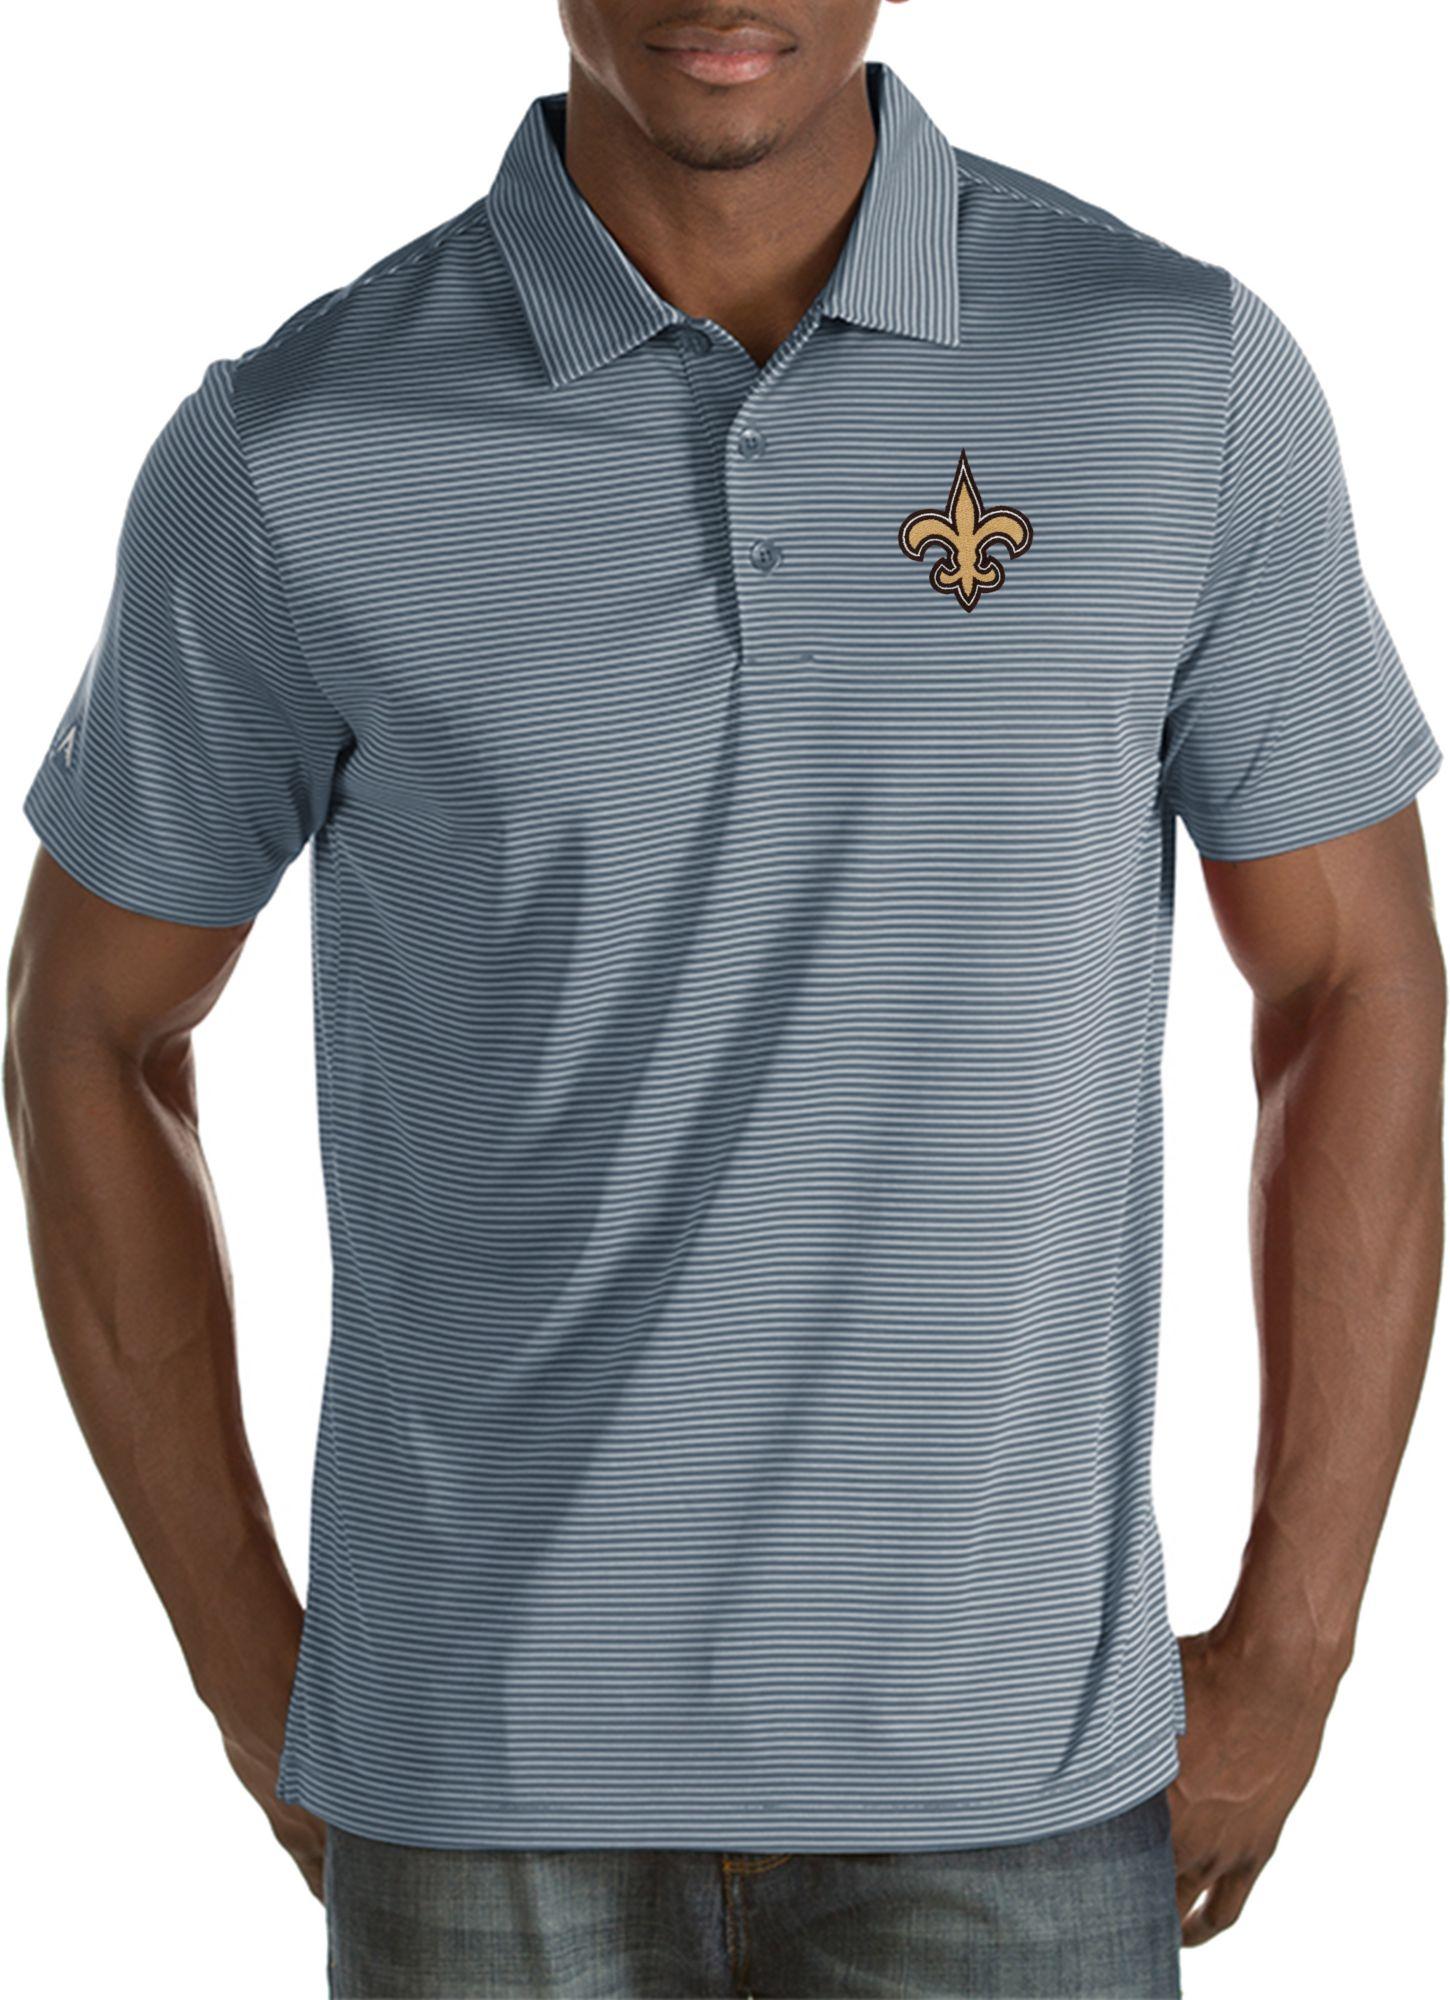 saints polo shirt